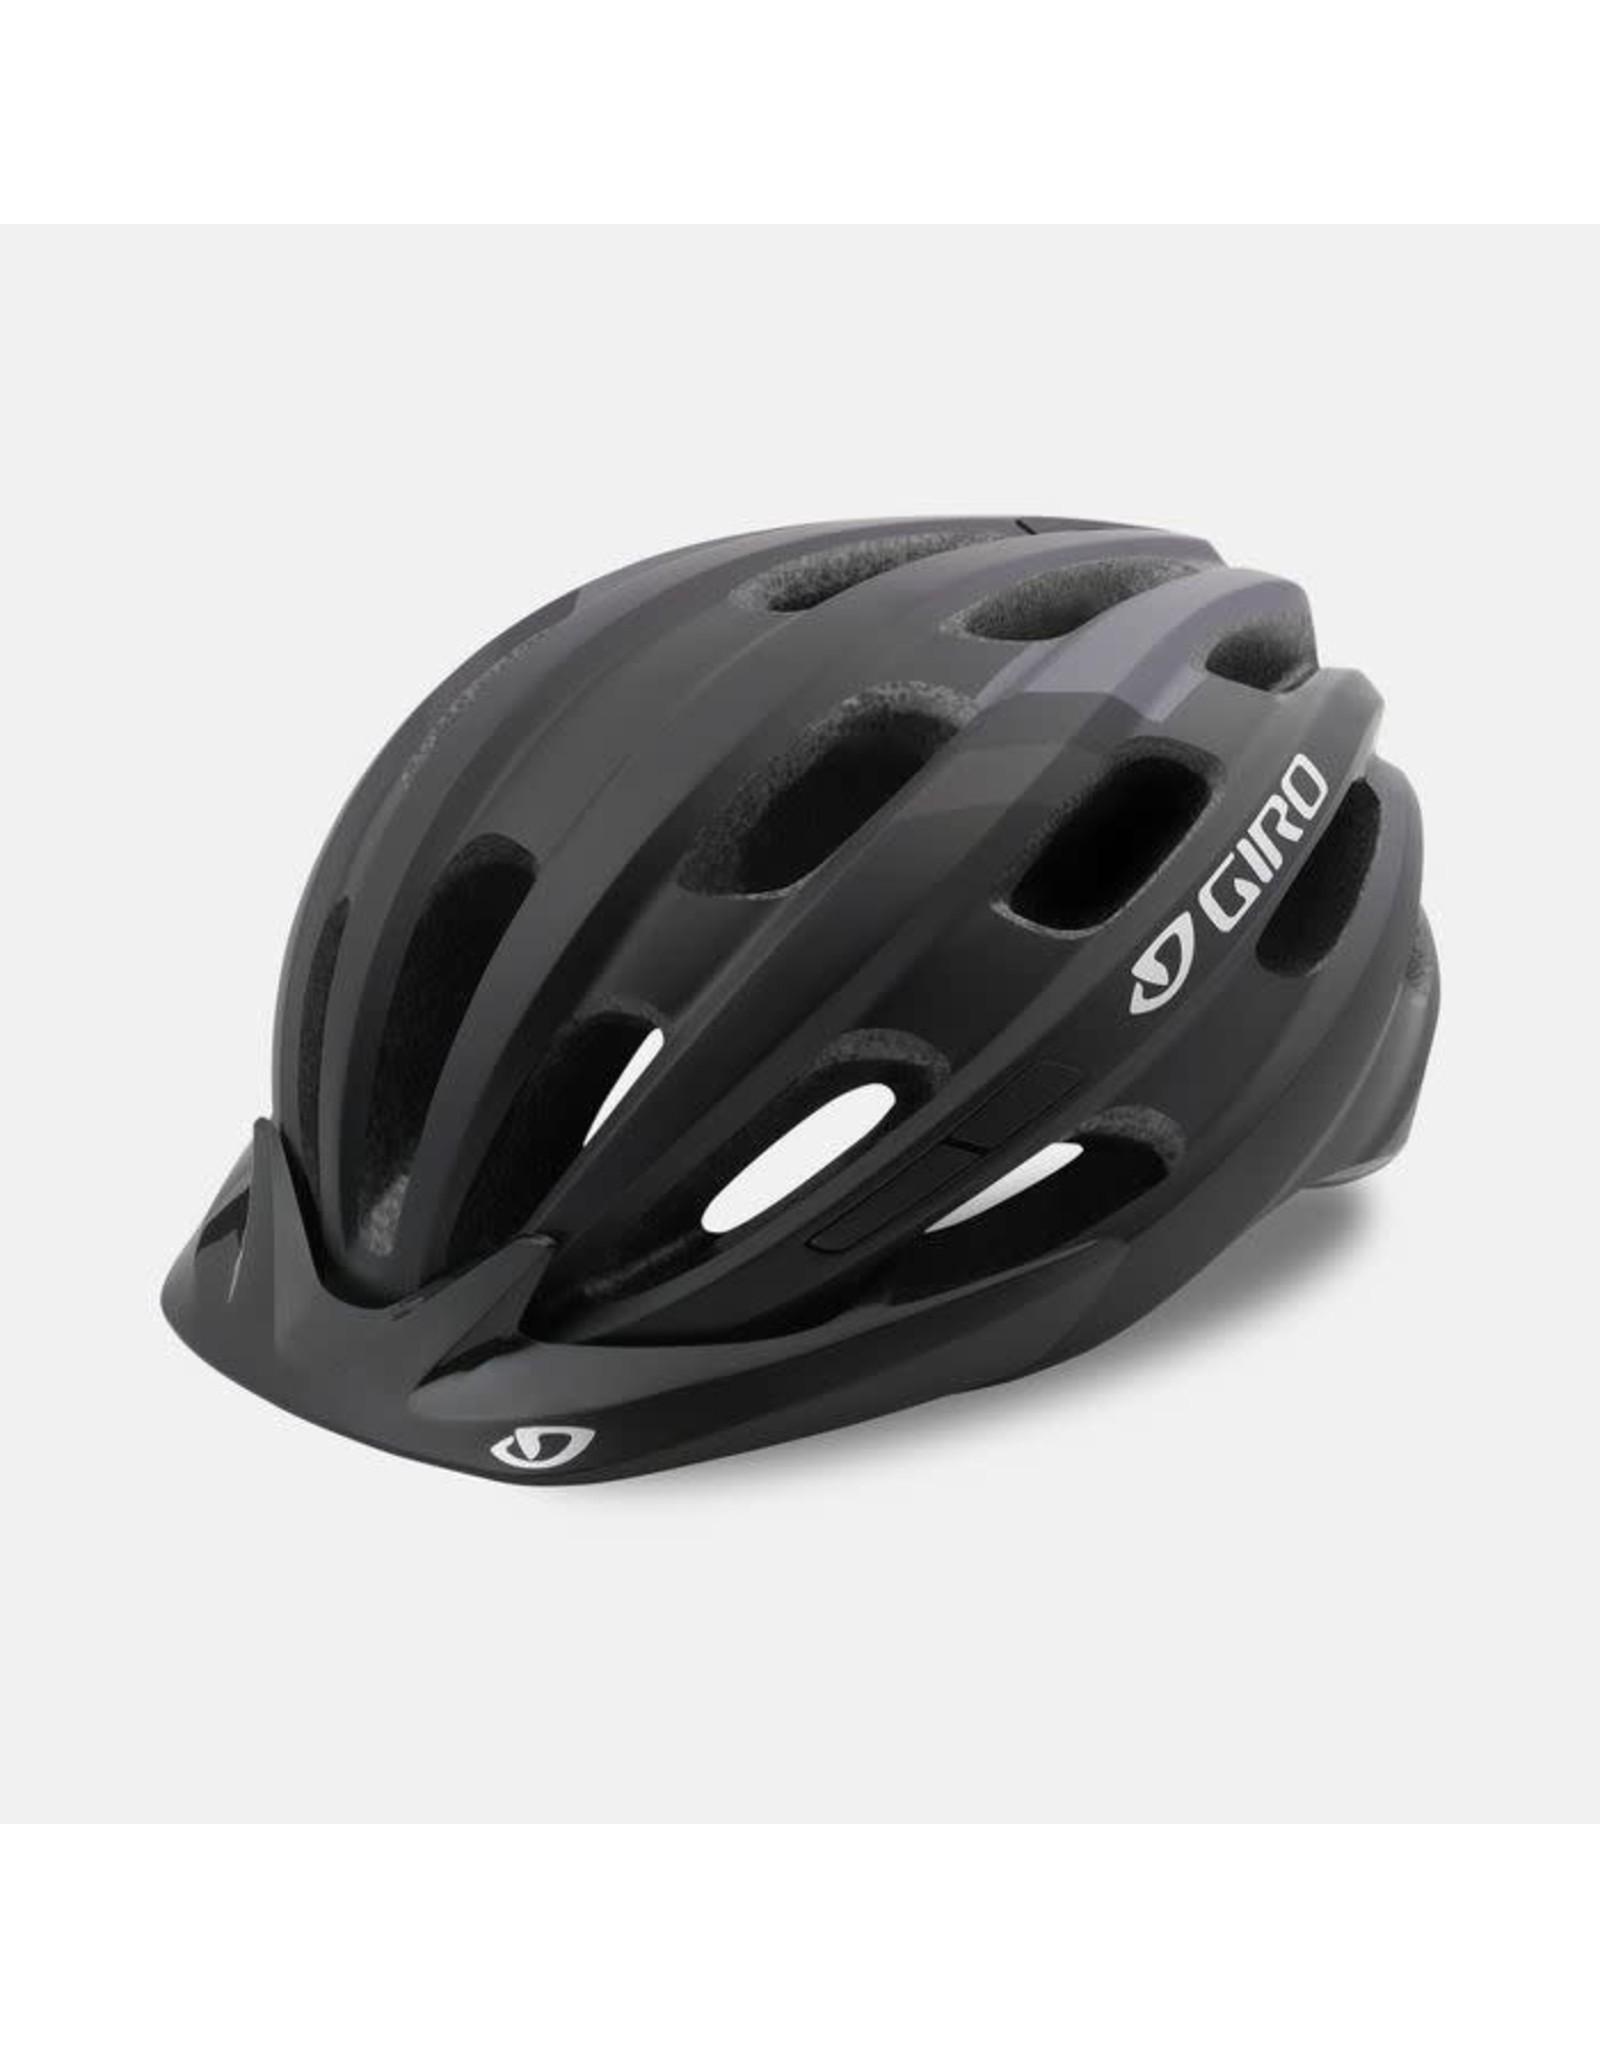 Giro Cycling Giro Register MIPS Universal Fit Helmet